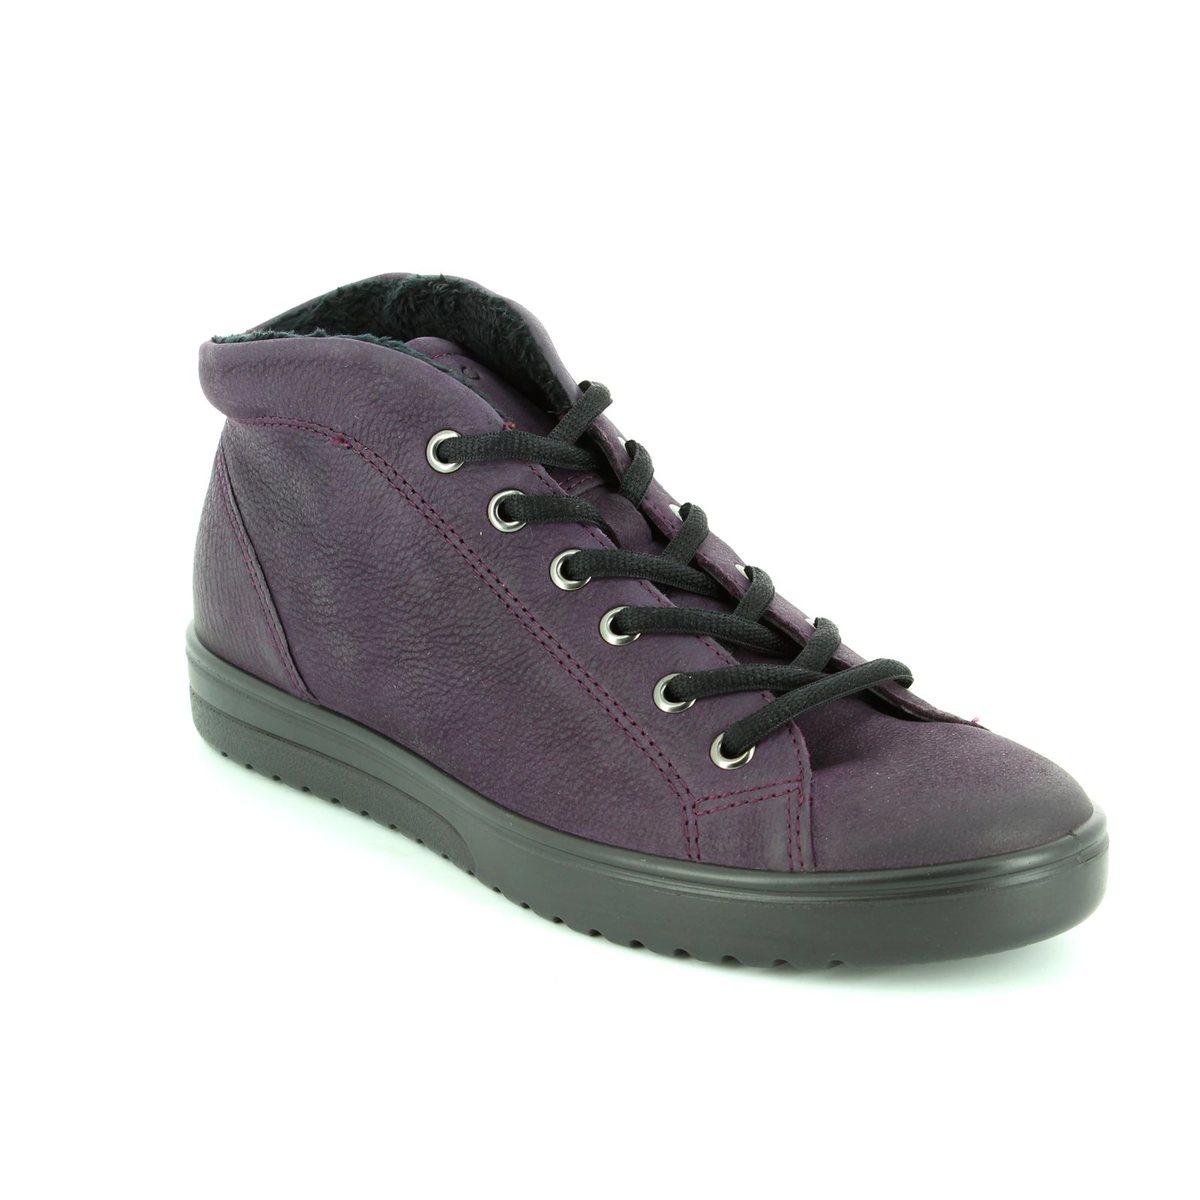 ECCO Ankle Boots - Aubergine - 235343/02276 FARA HI